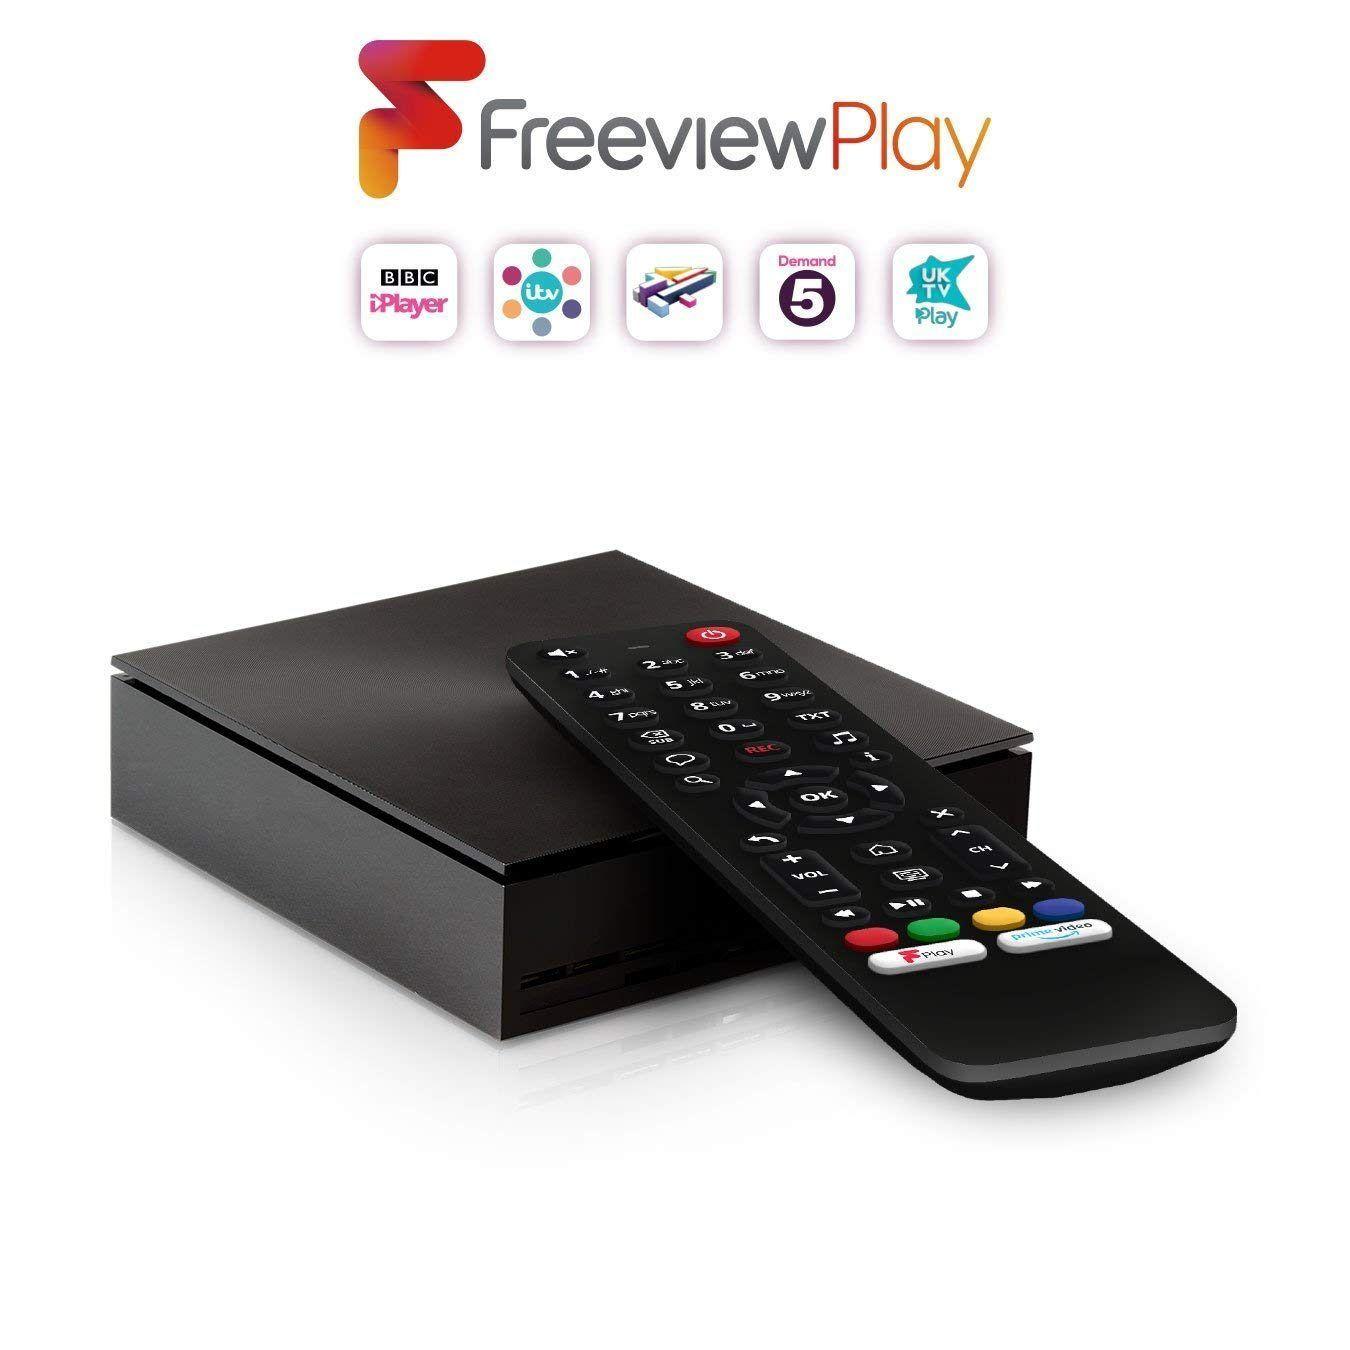 NetGem NetBox HD with Freeview Play. £49 for Three Customers via Wuntu App